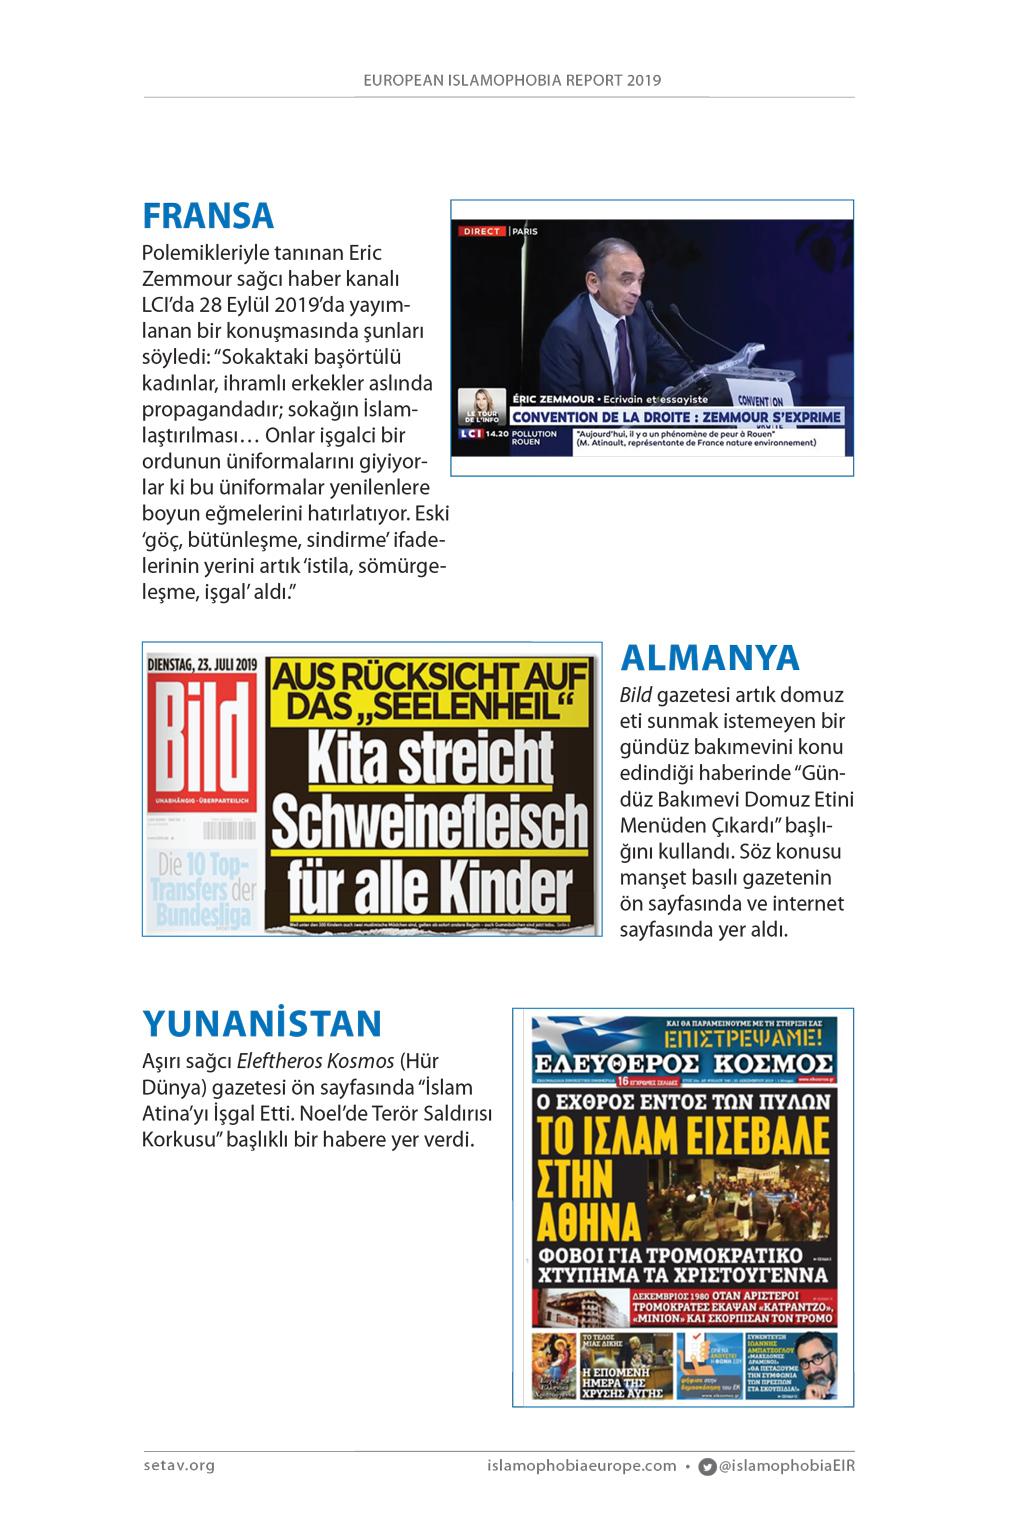 medyada-islamofobi-2019-3